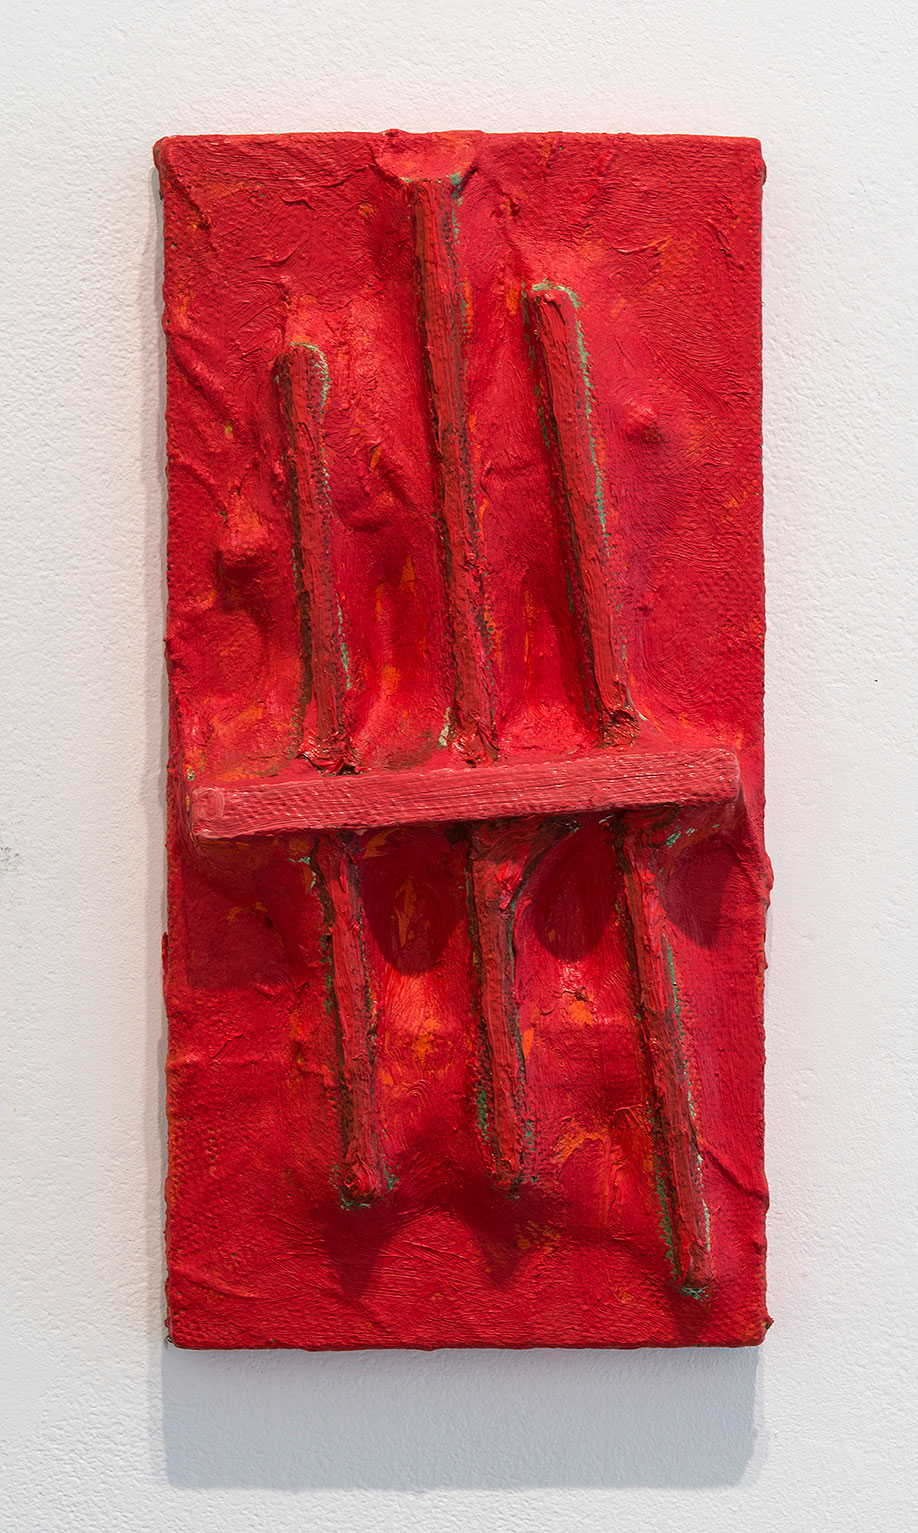 <b>Title:</b>Point<br /><b>Year:</b>1992<br /><b>Medium:</b>Oil and cardboard tubing on canvas and board<br /><b>Size:</b>38 x 19 x 5.5 cm